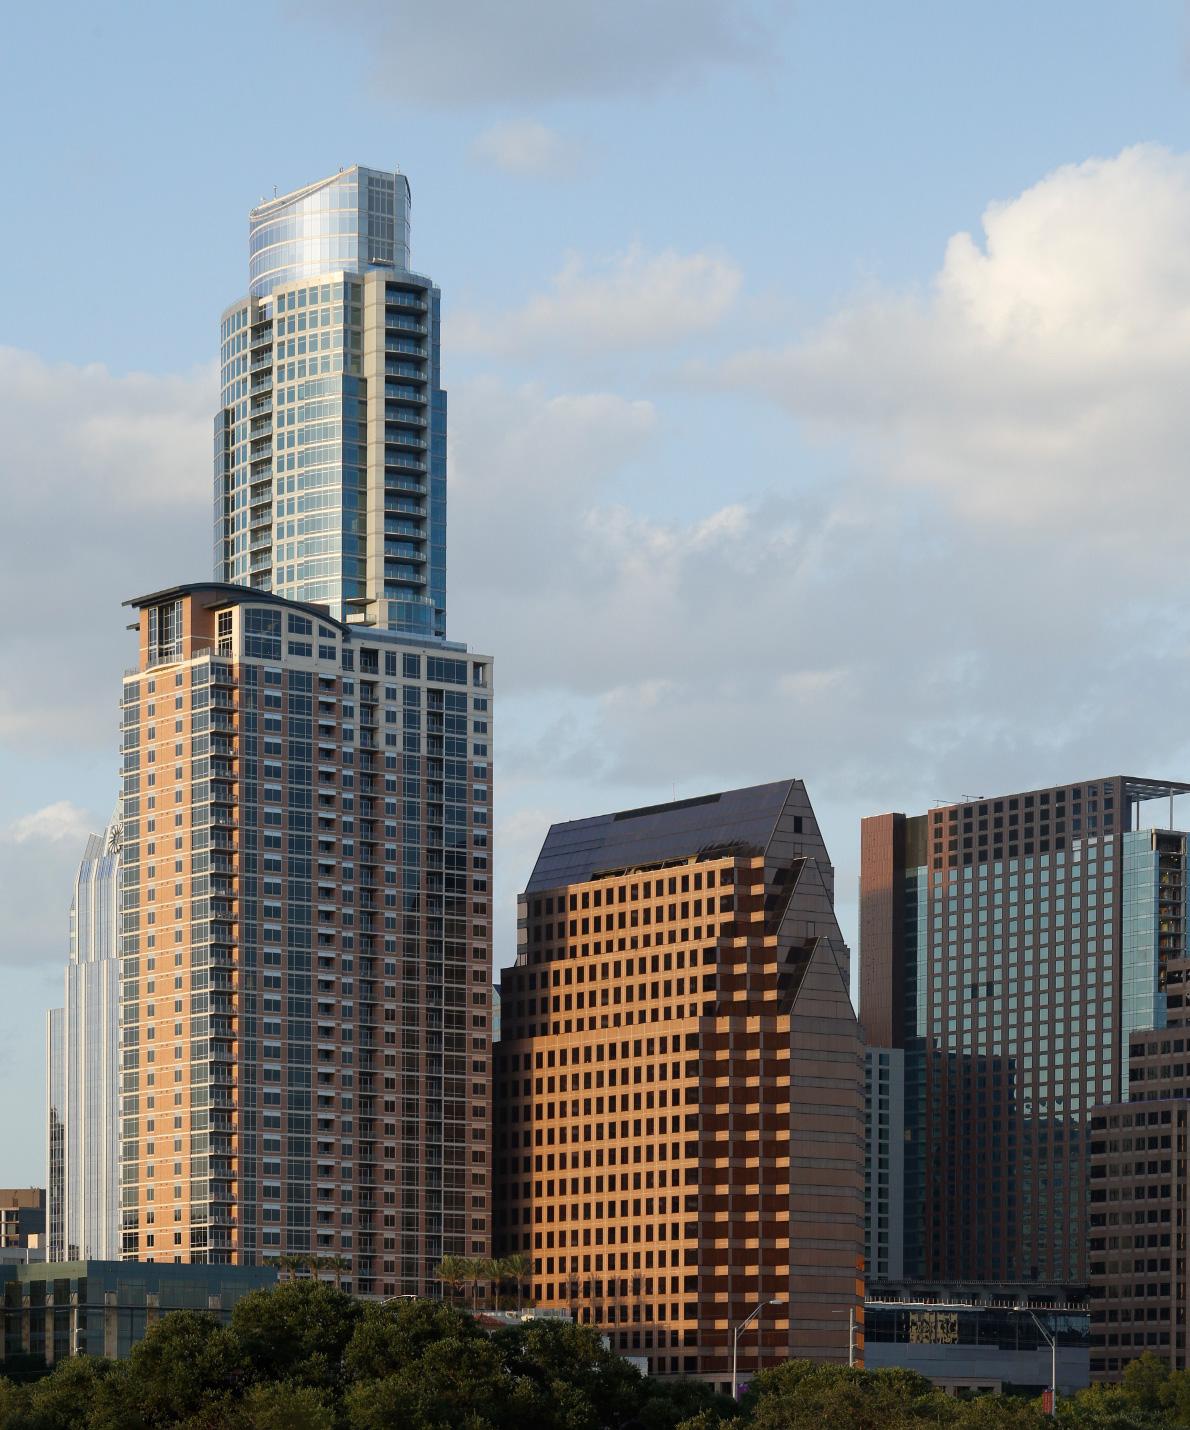 Segment of the Austin skyline